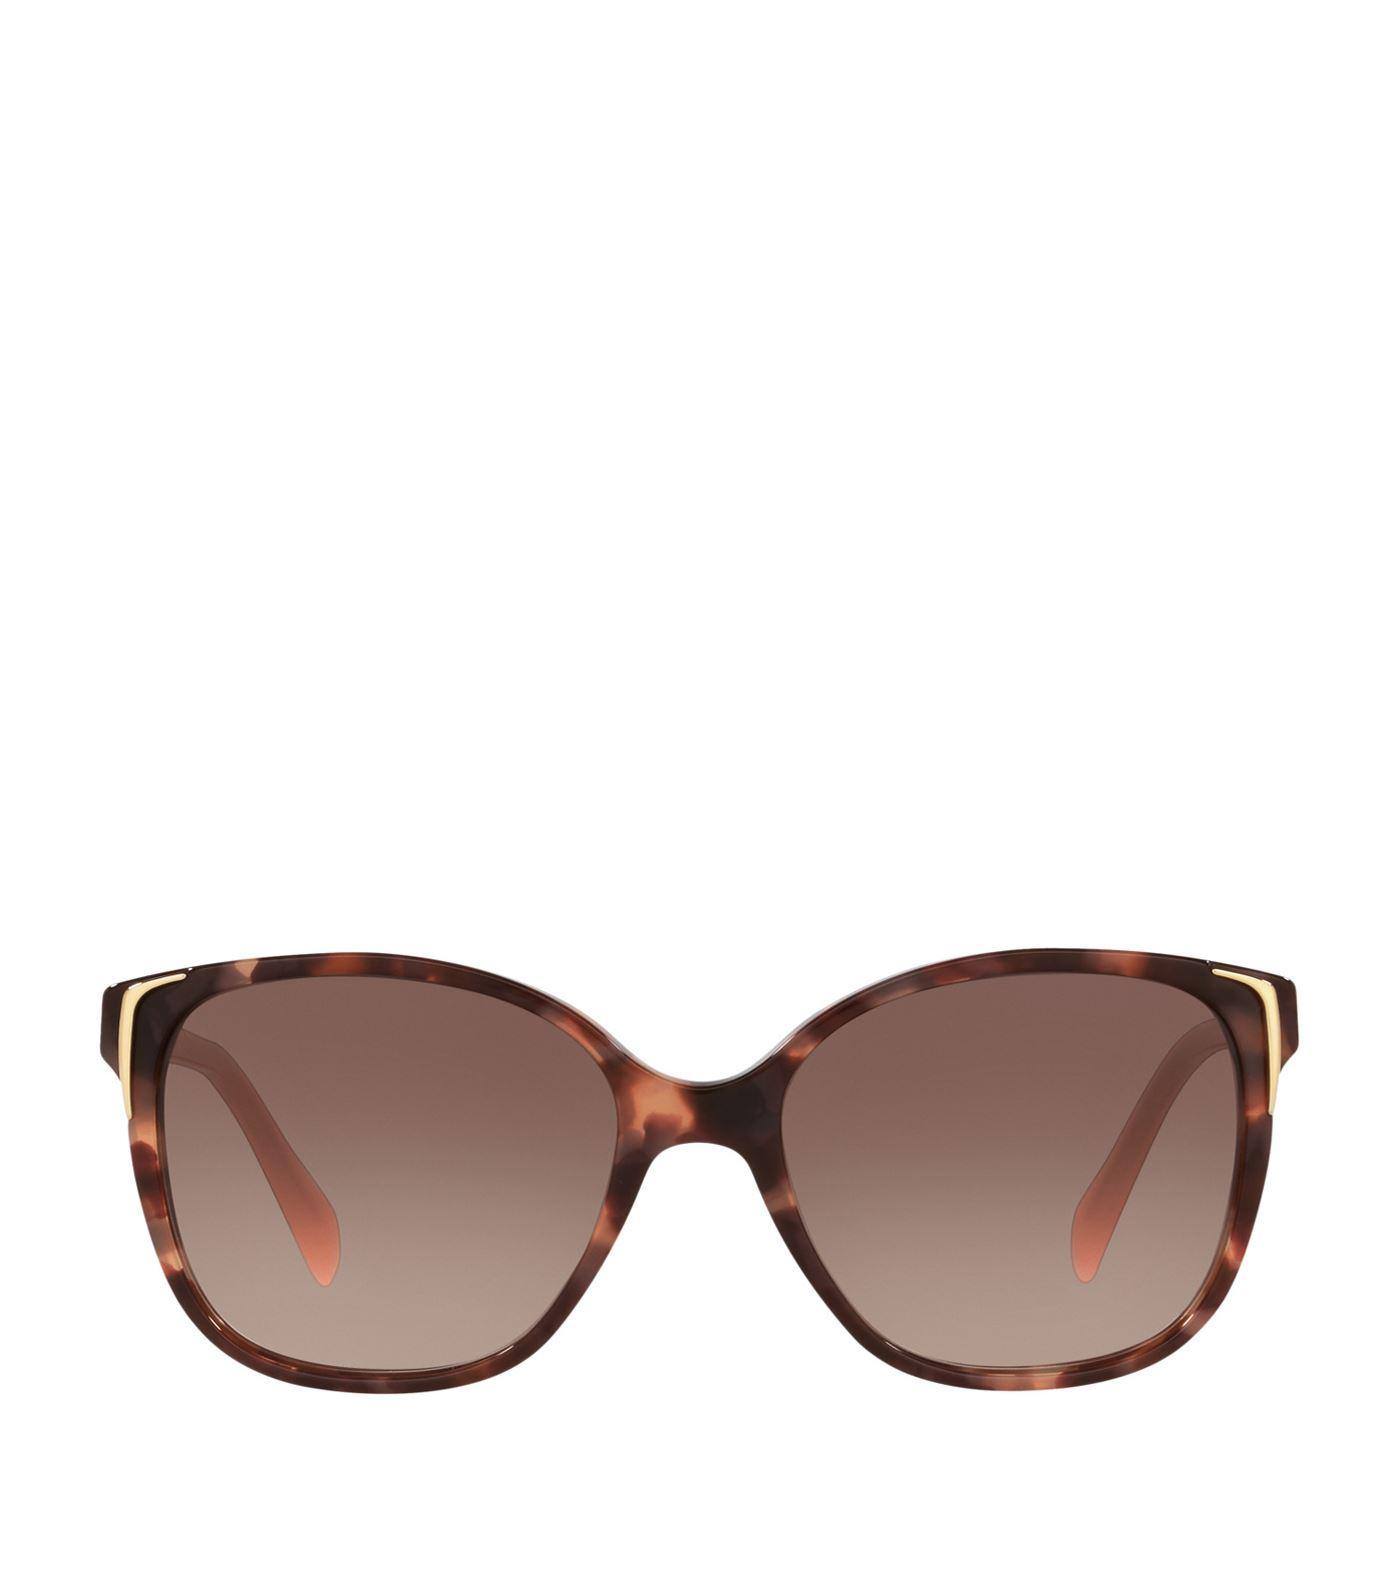 747056ccdedd9 Prada Oversized Tortoiseshell Sunglasses In Pink